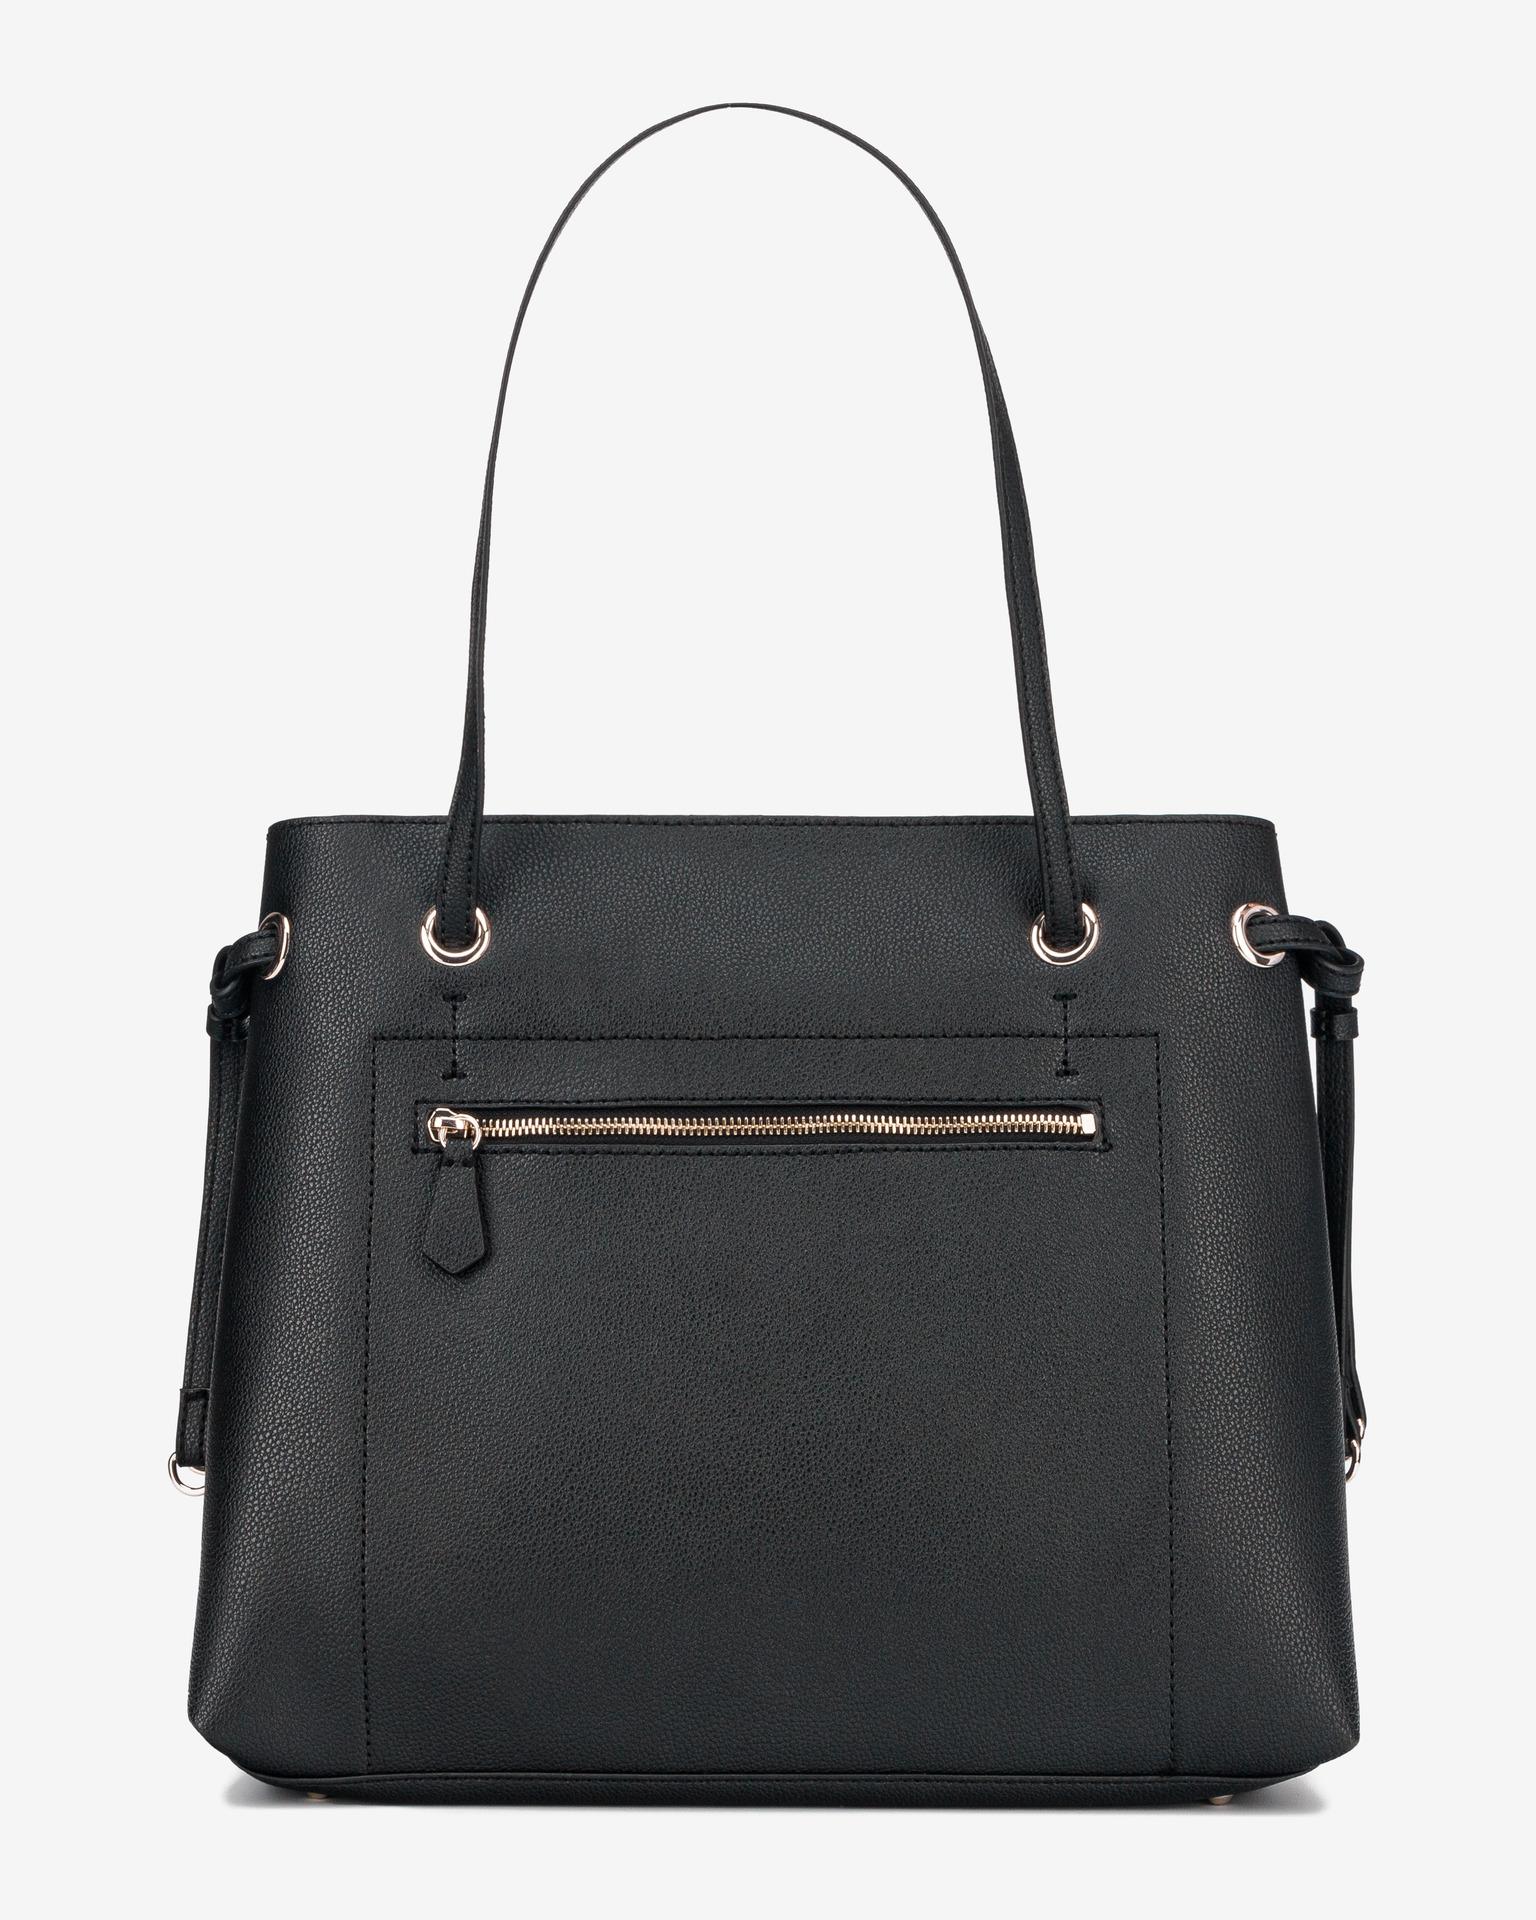 Guess black handbag Digital